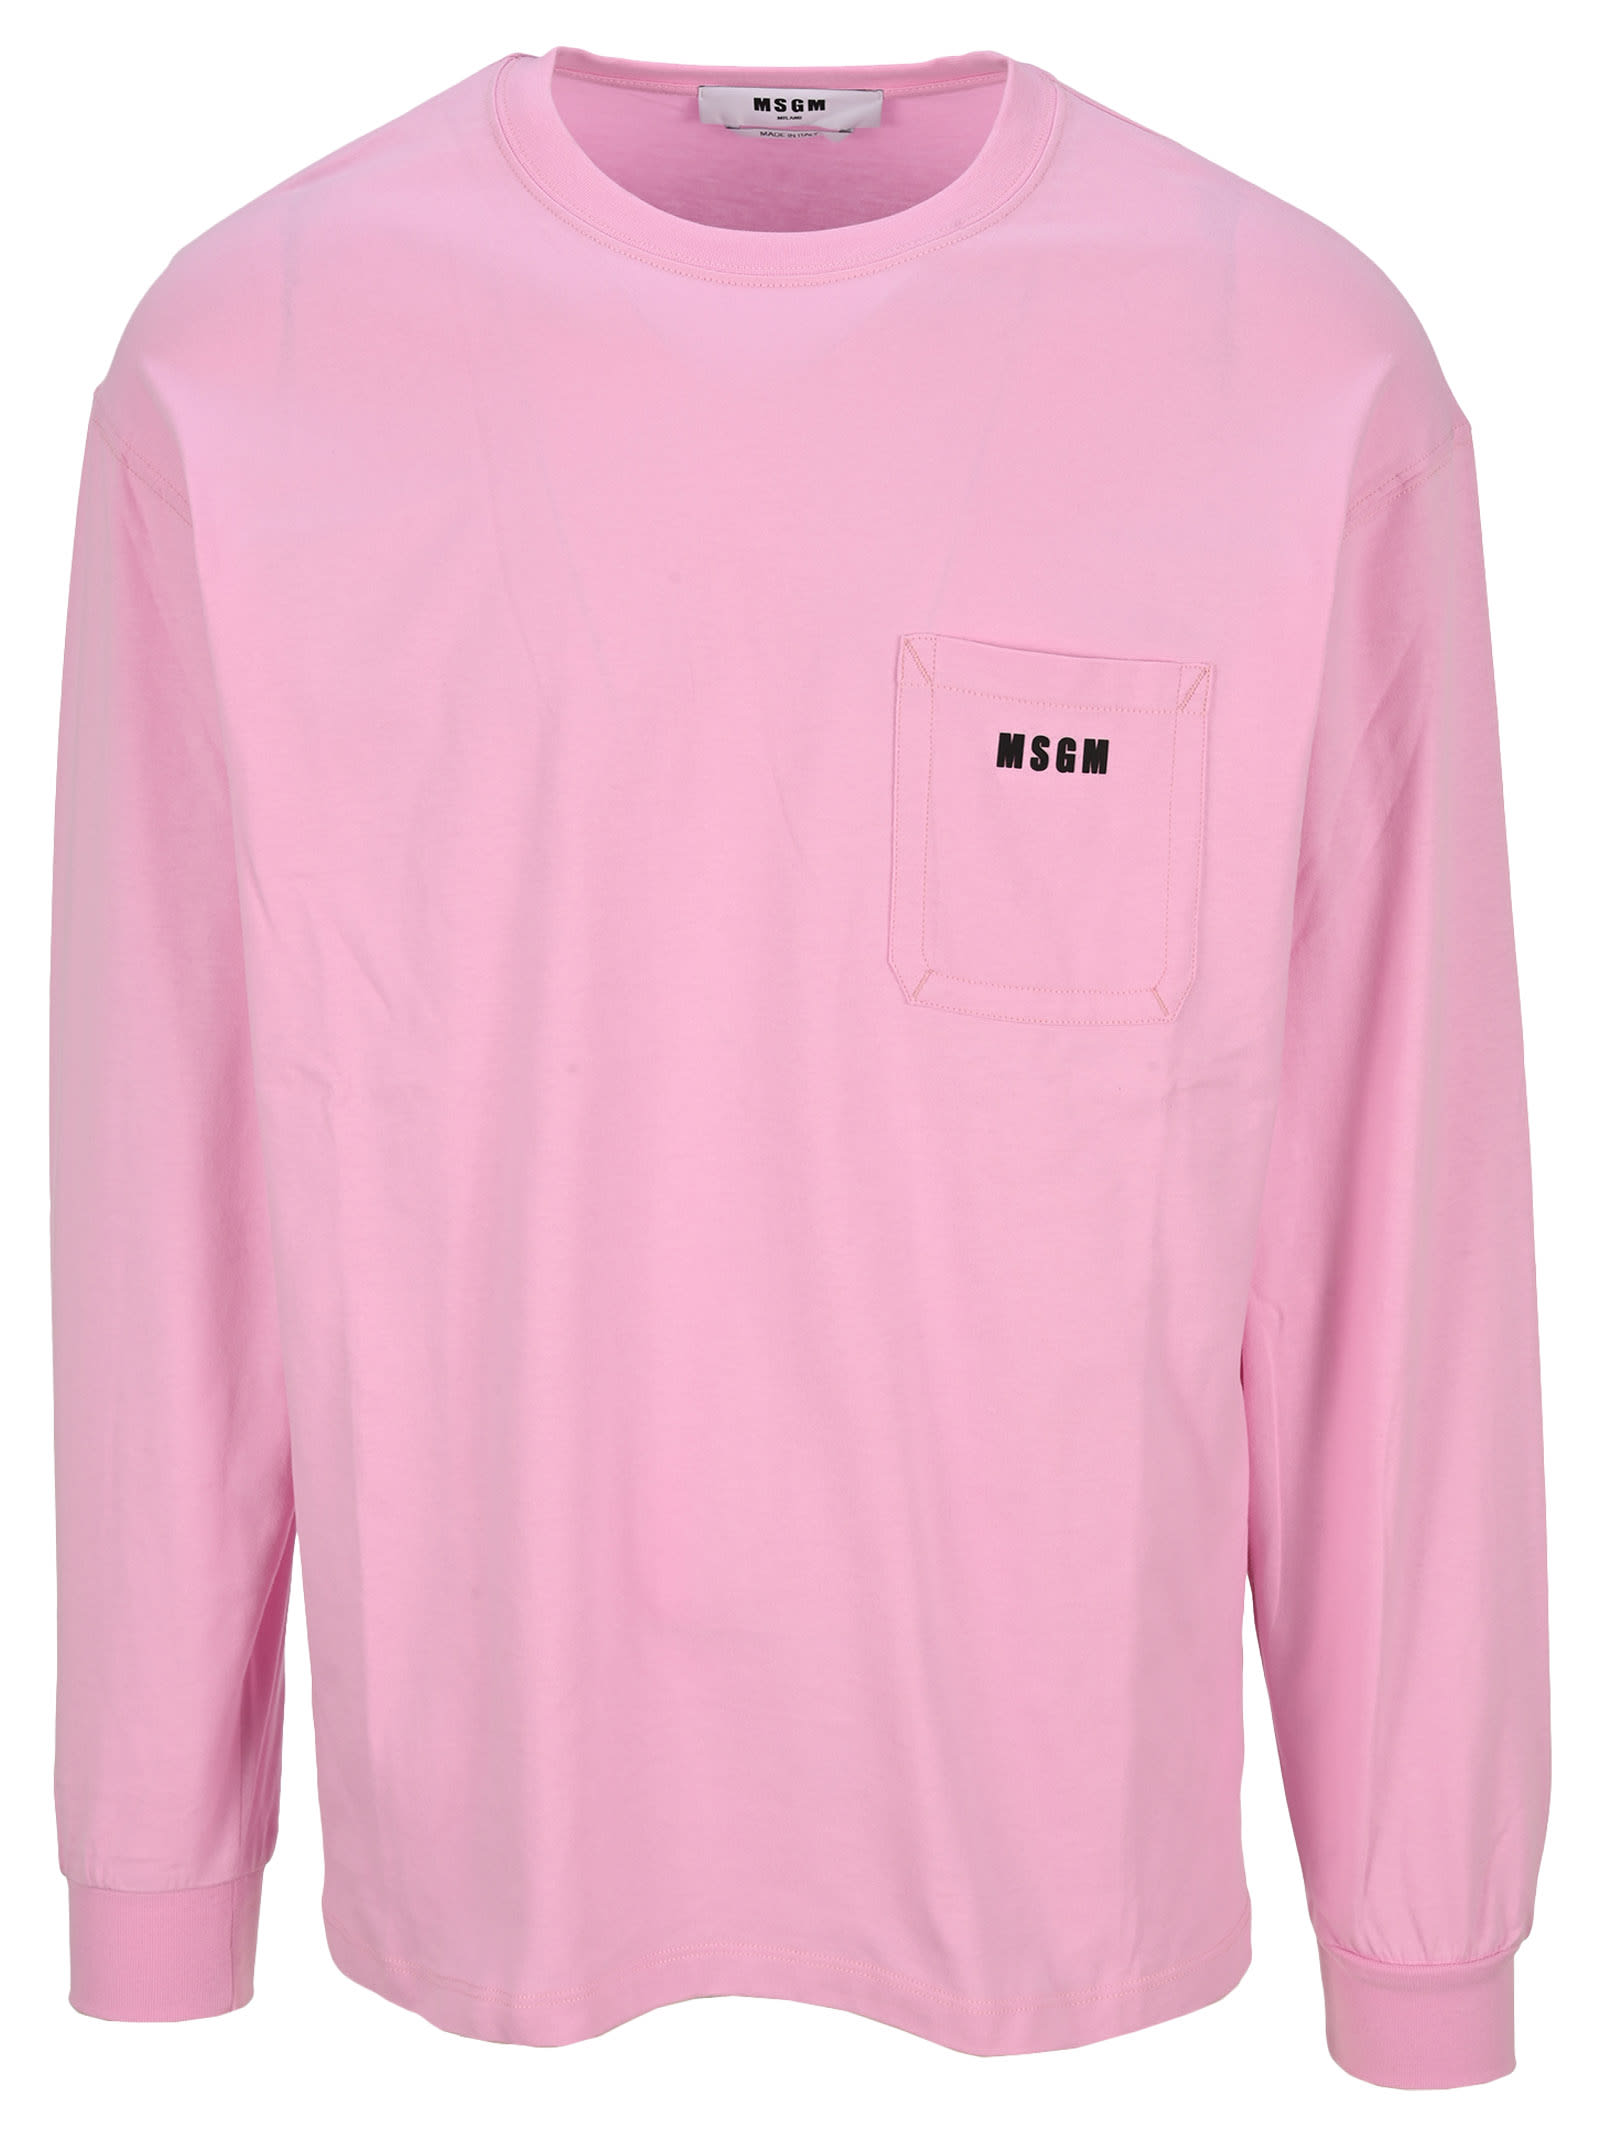 Msgm Chest Pocket T-shirt